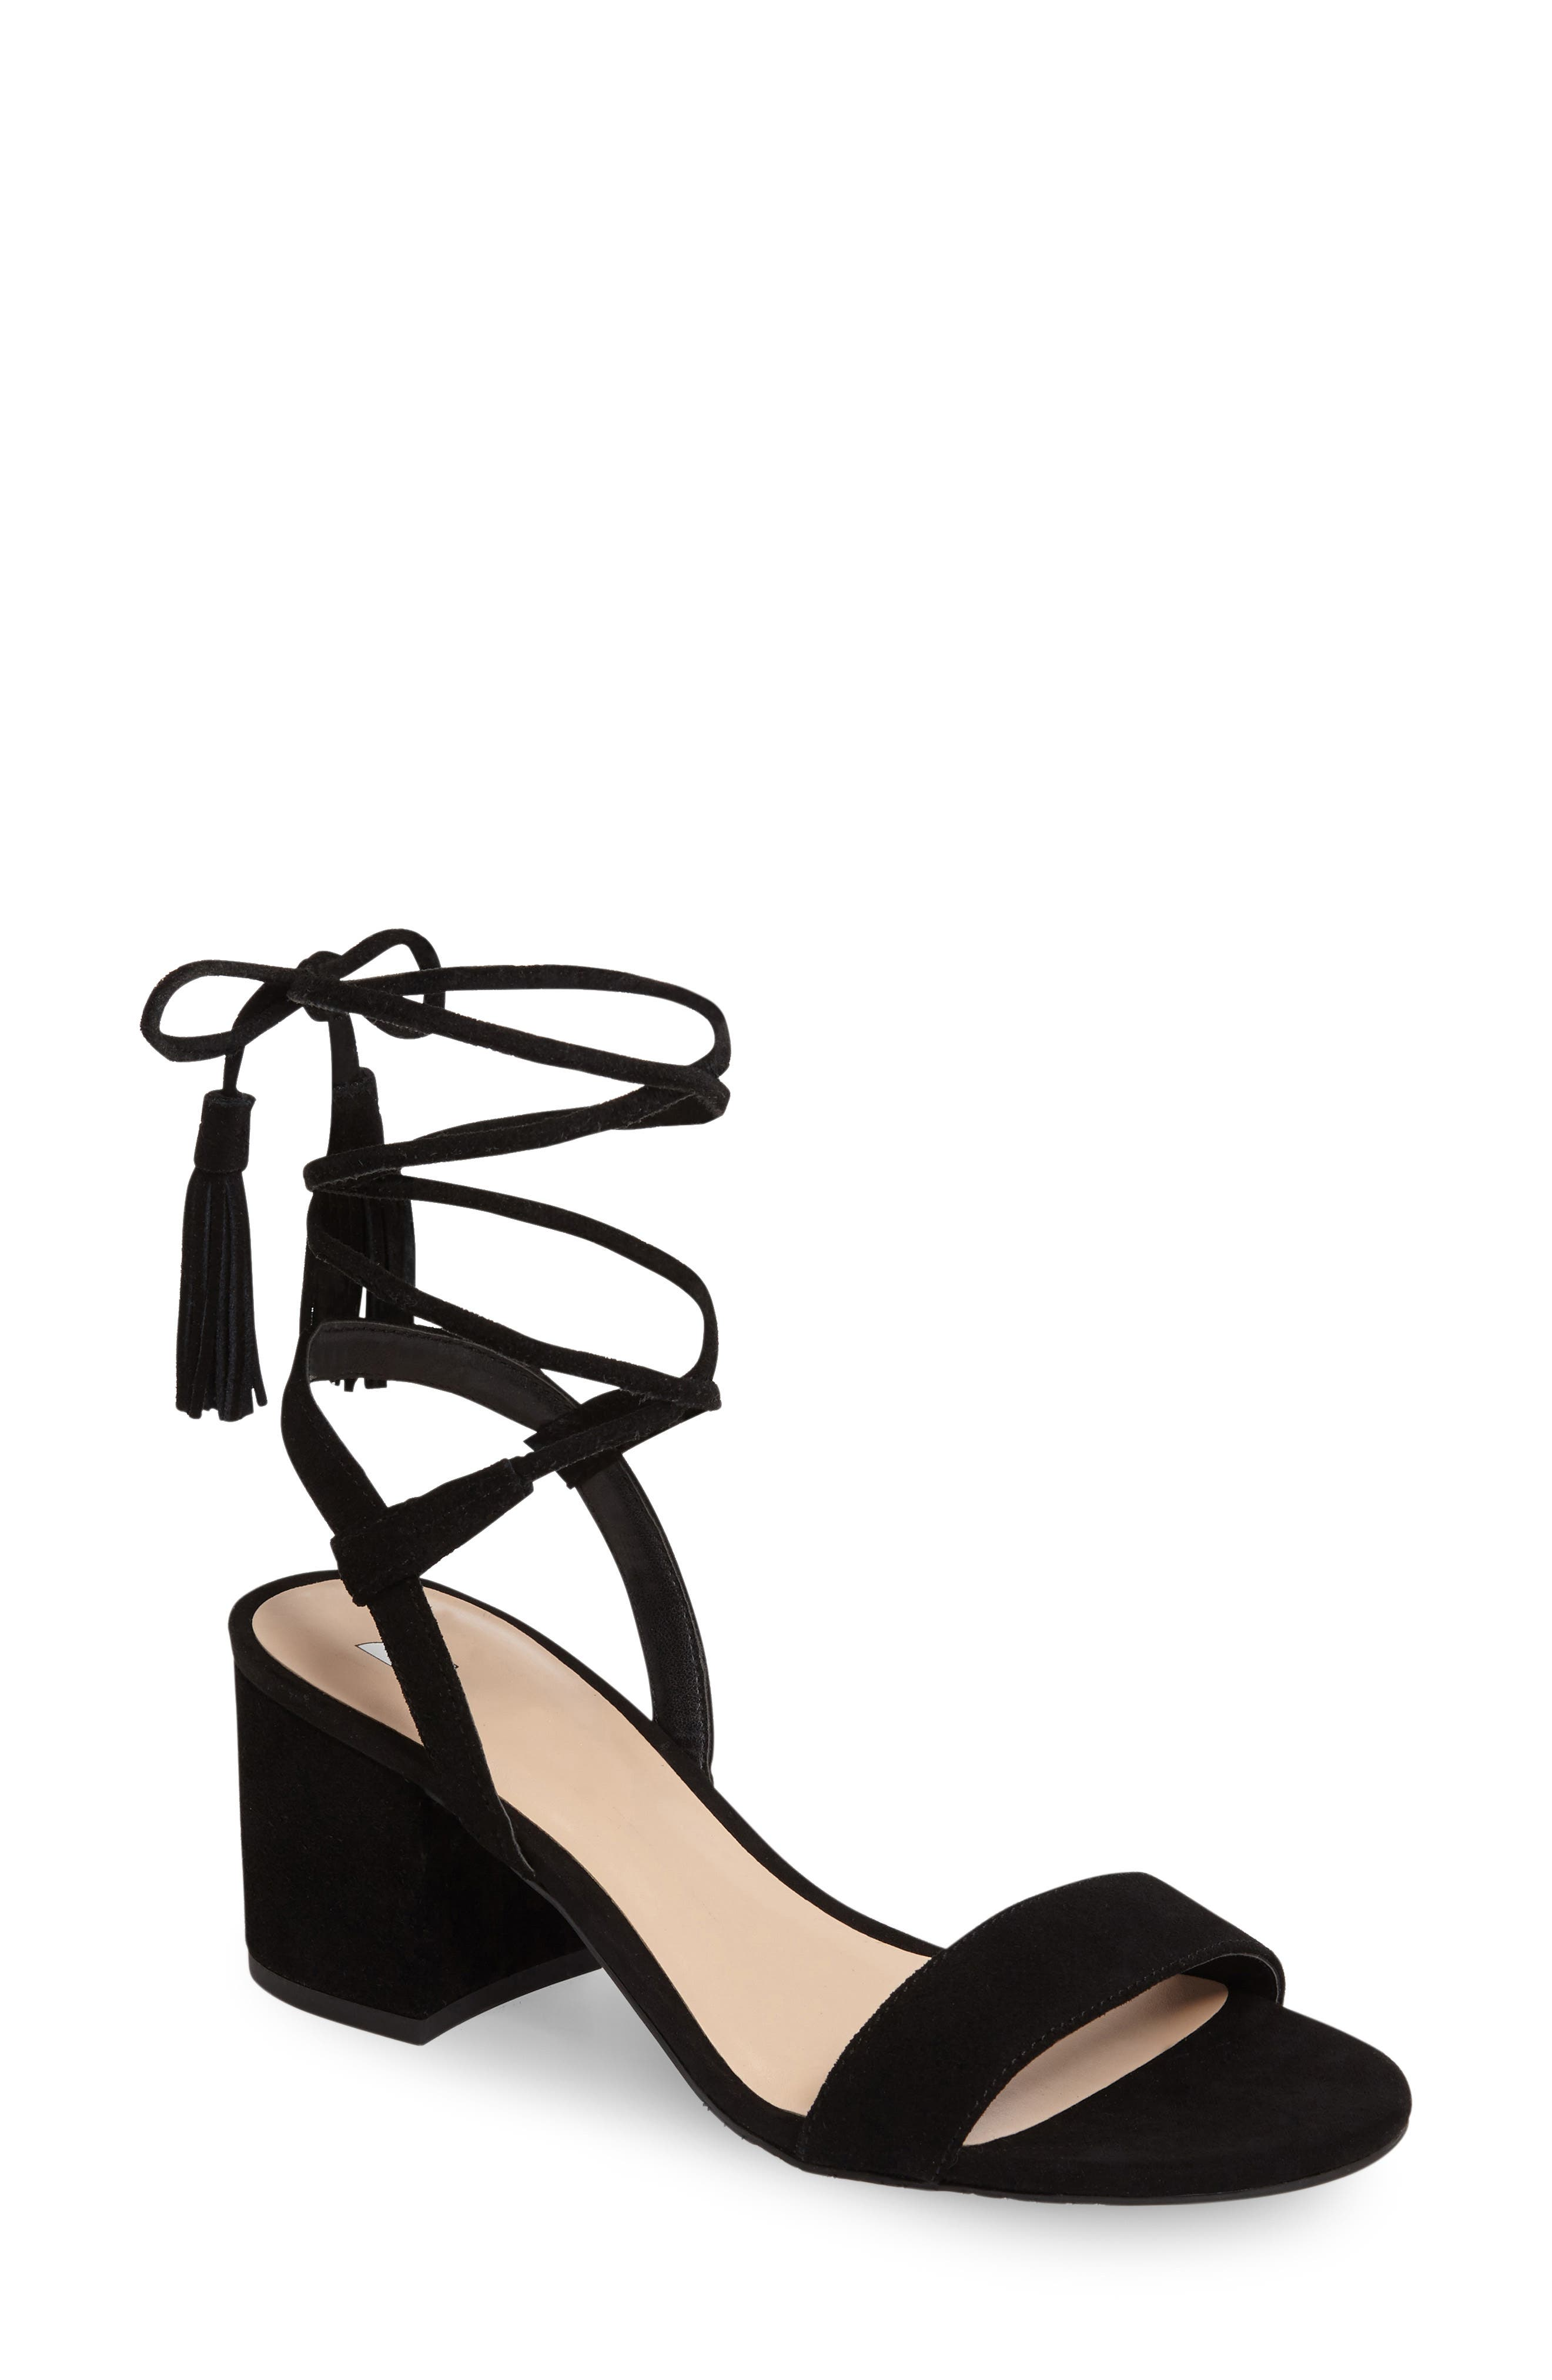 Karla Block Heel Ankle Wrap Sandal, Main, color, 001